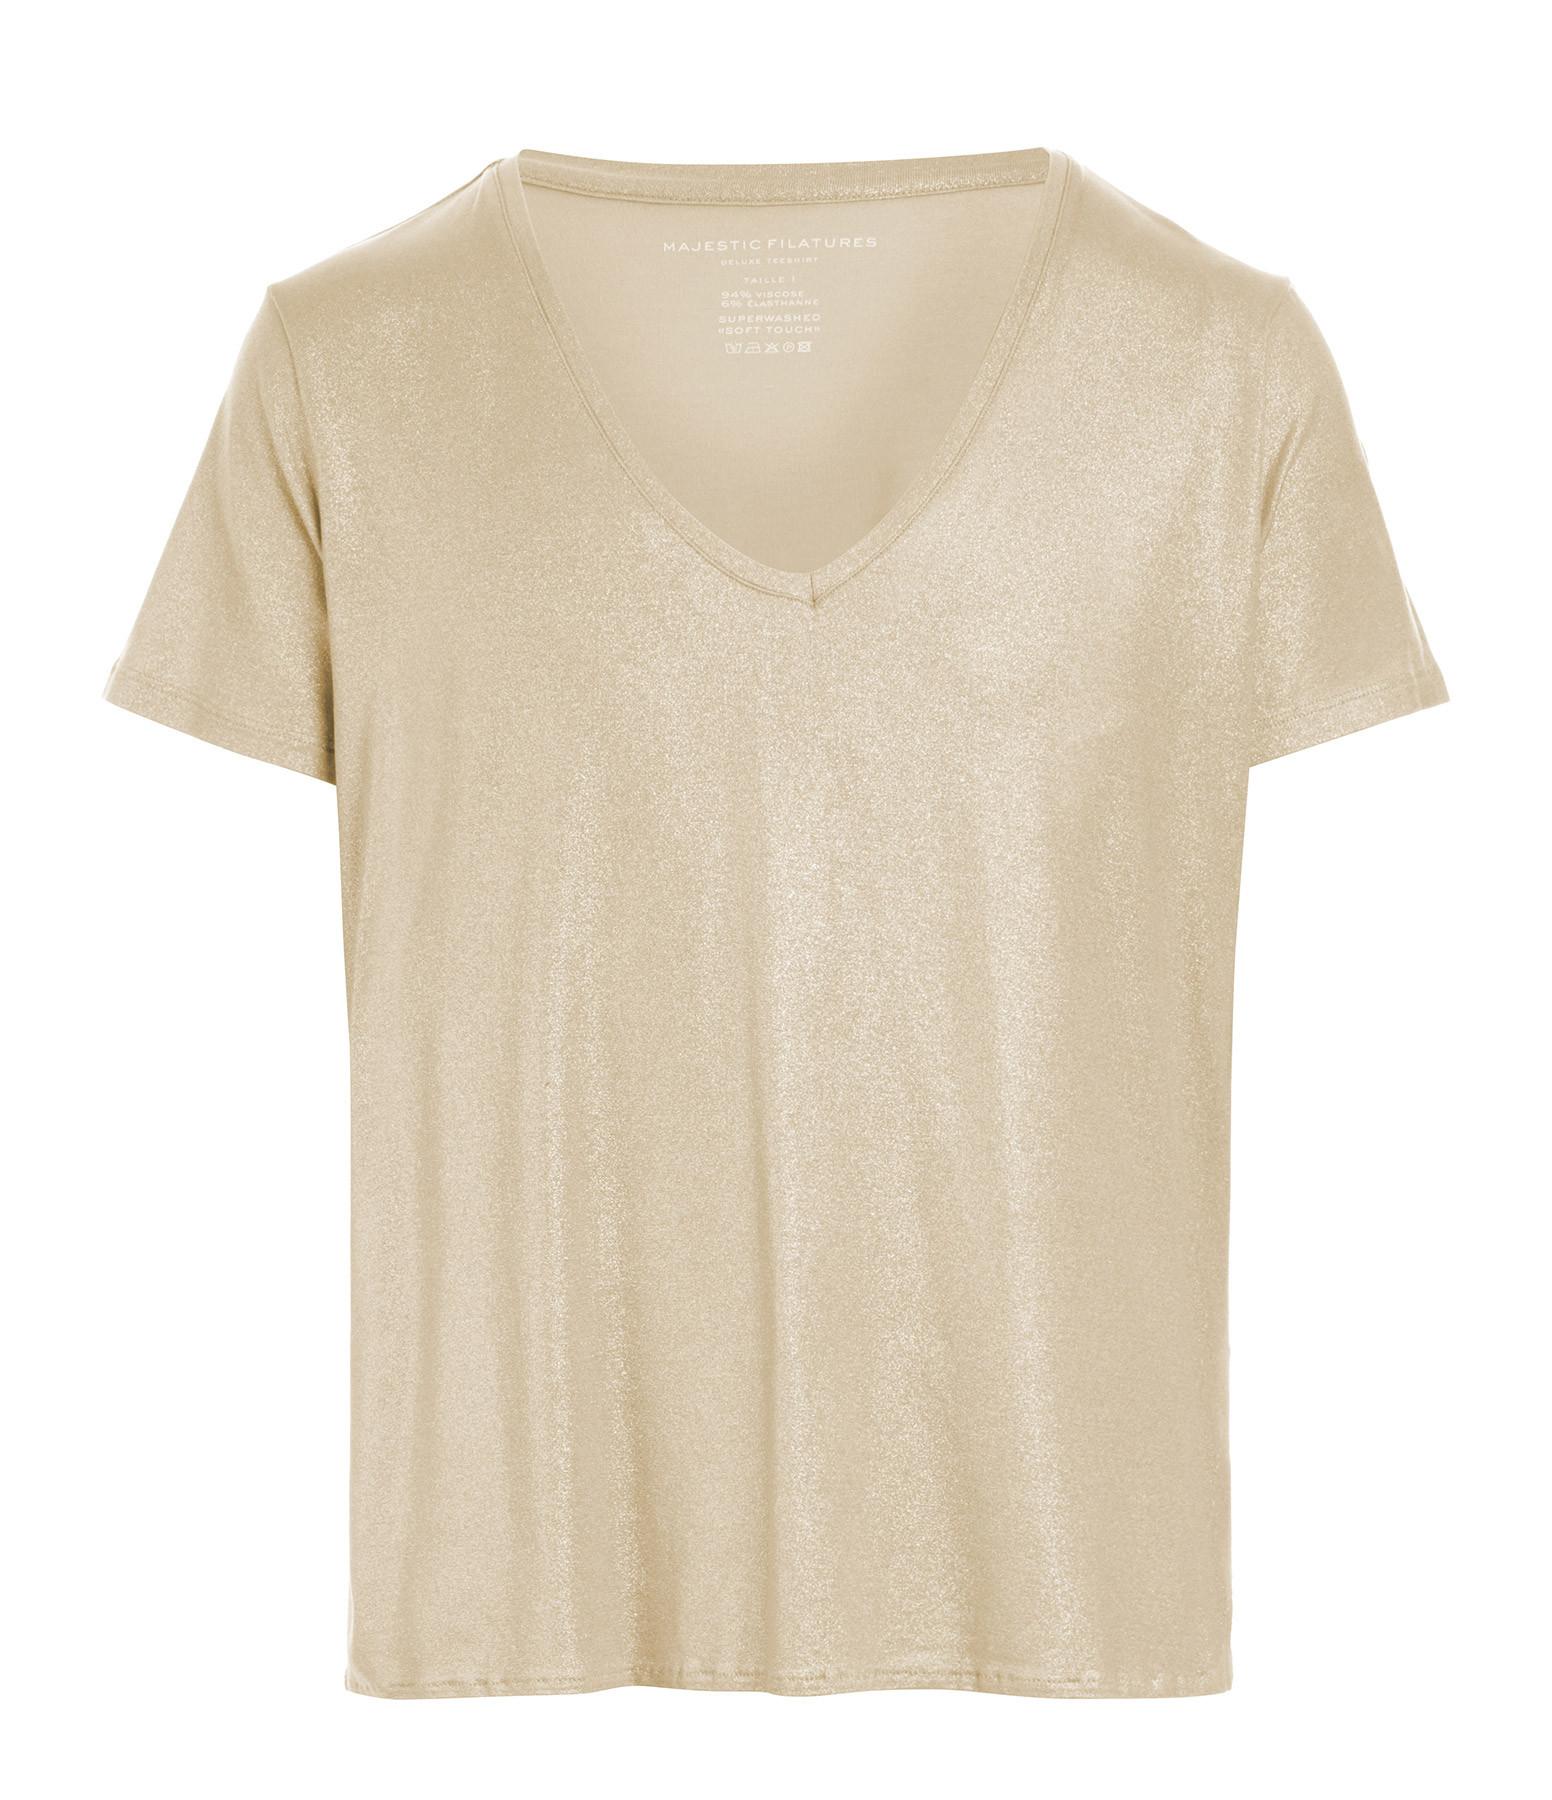 MAJESTIC FILATURES - Tee-shirt Col V Sable Doré